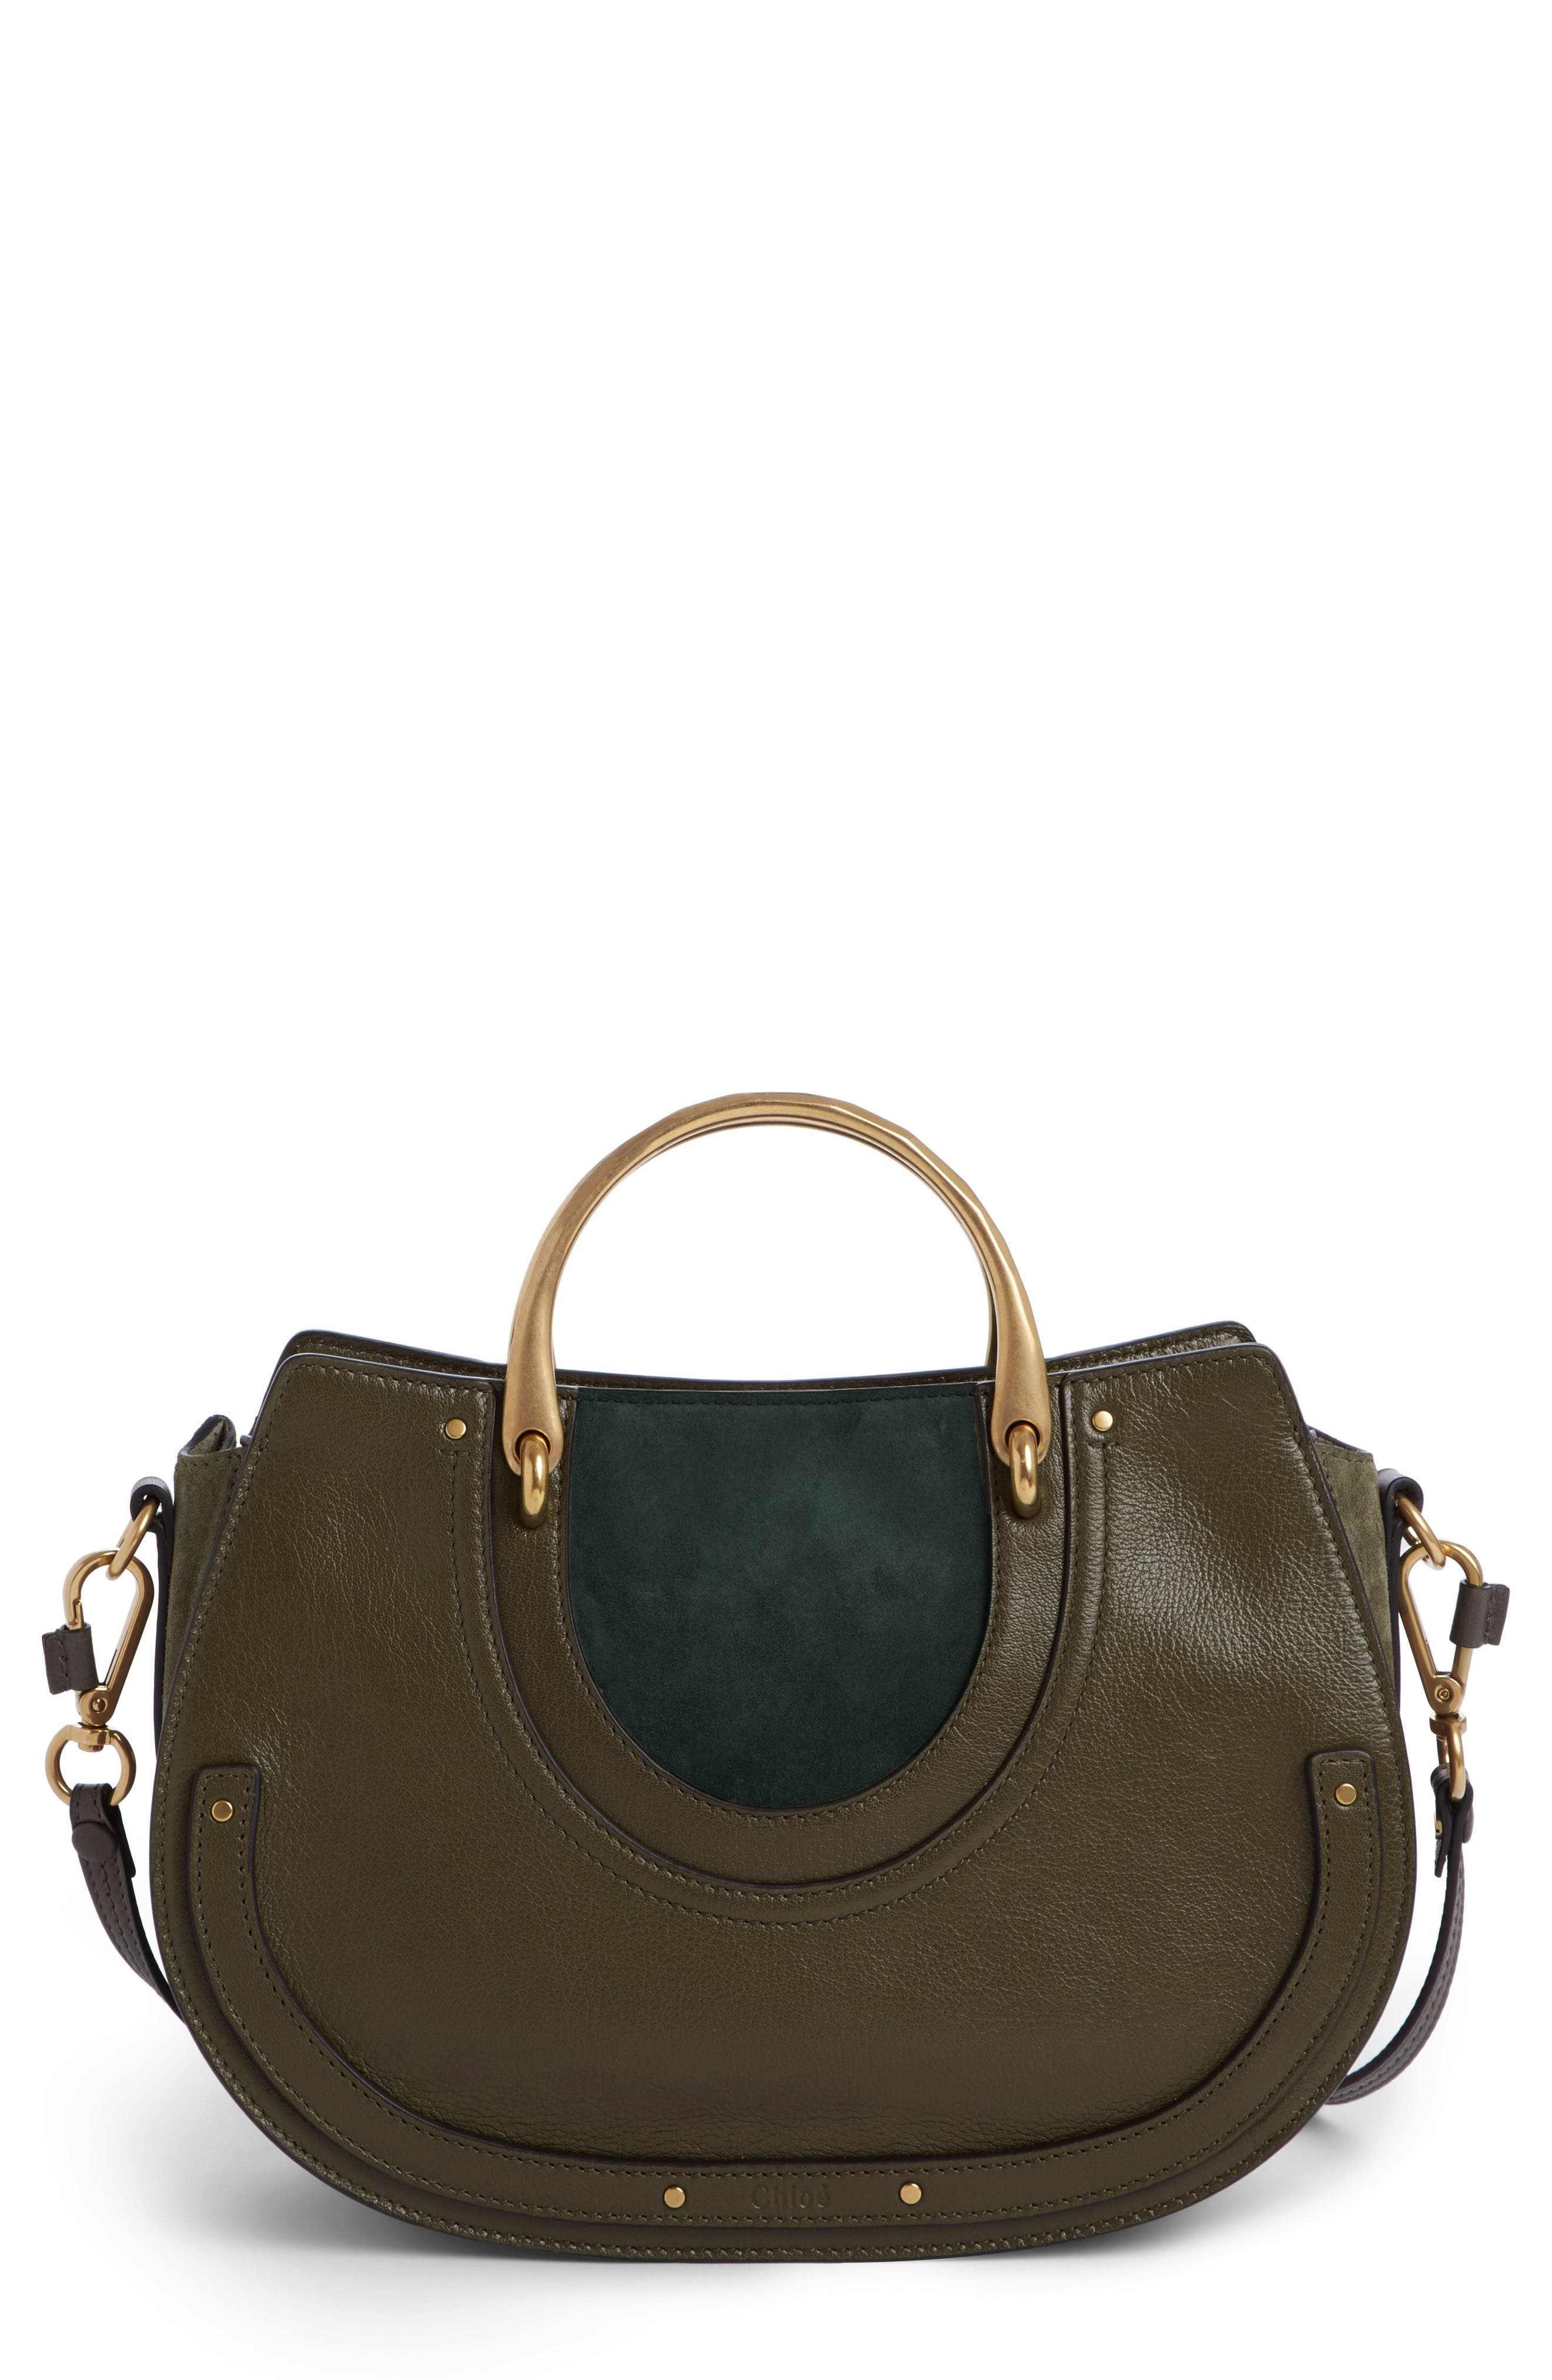 Medium Pixie Top Handle Leather Satchel,                             Main thumbnail 1, color,                             Intense Green